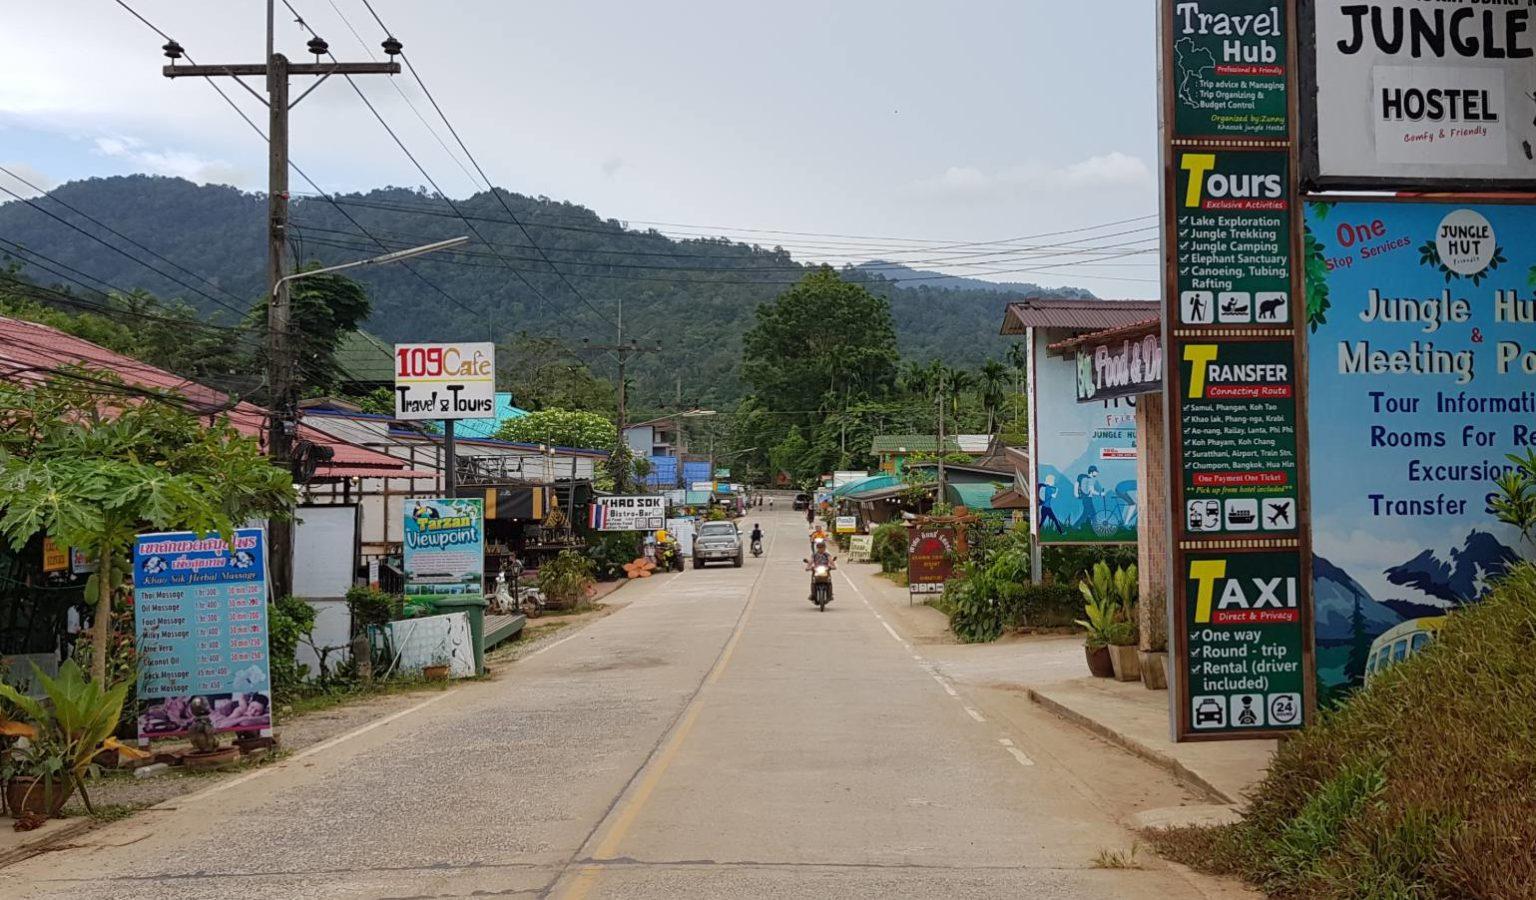 Khao Sok, straat van dorpje Khao Sok